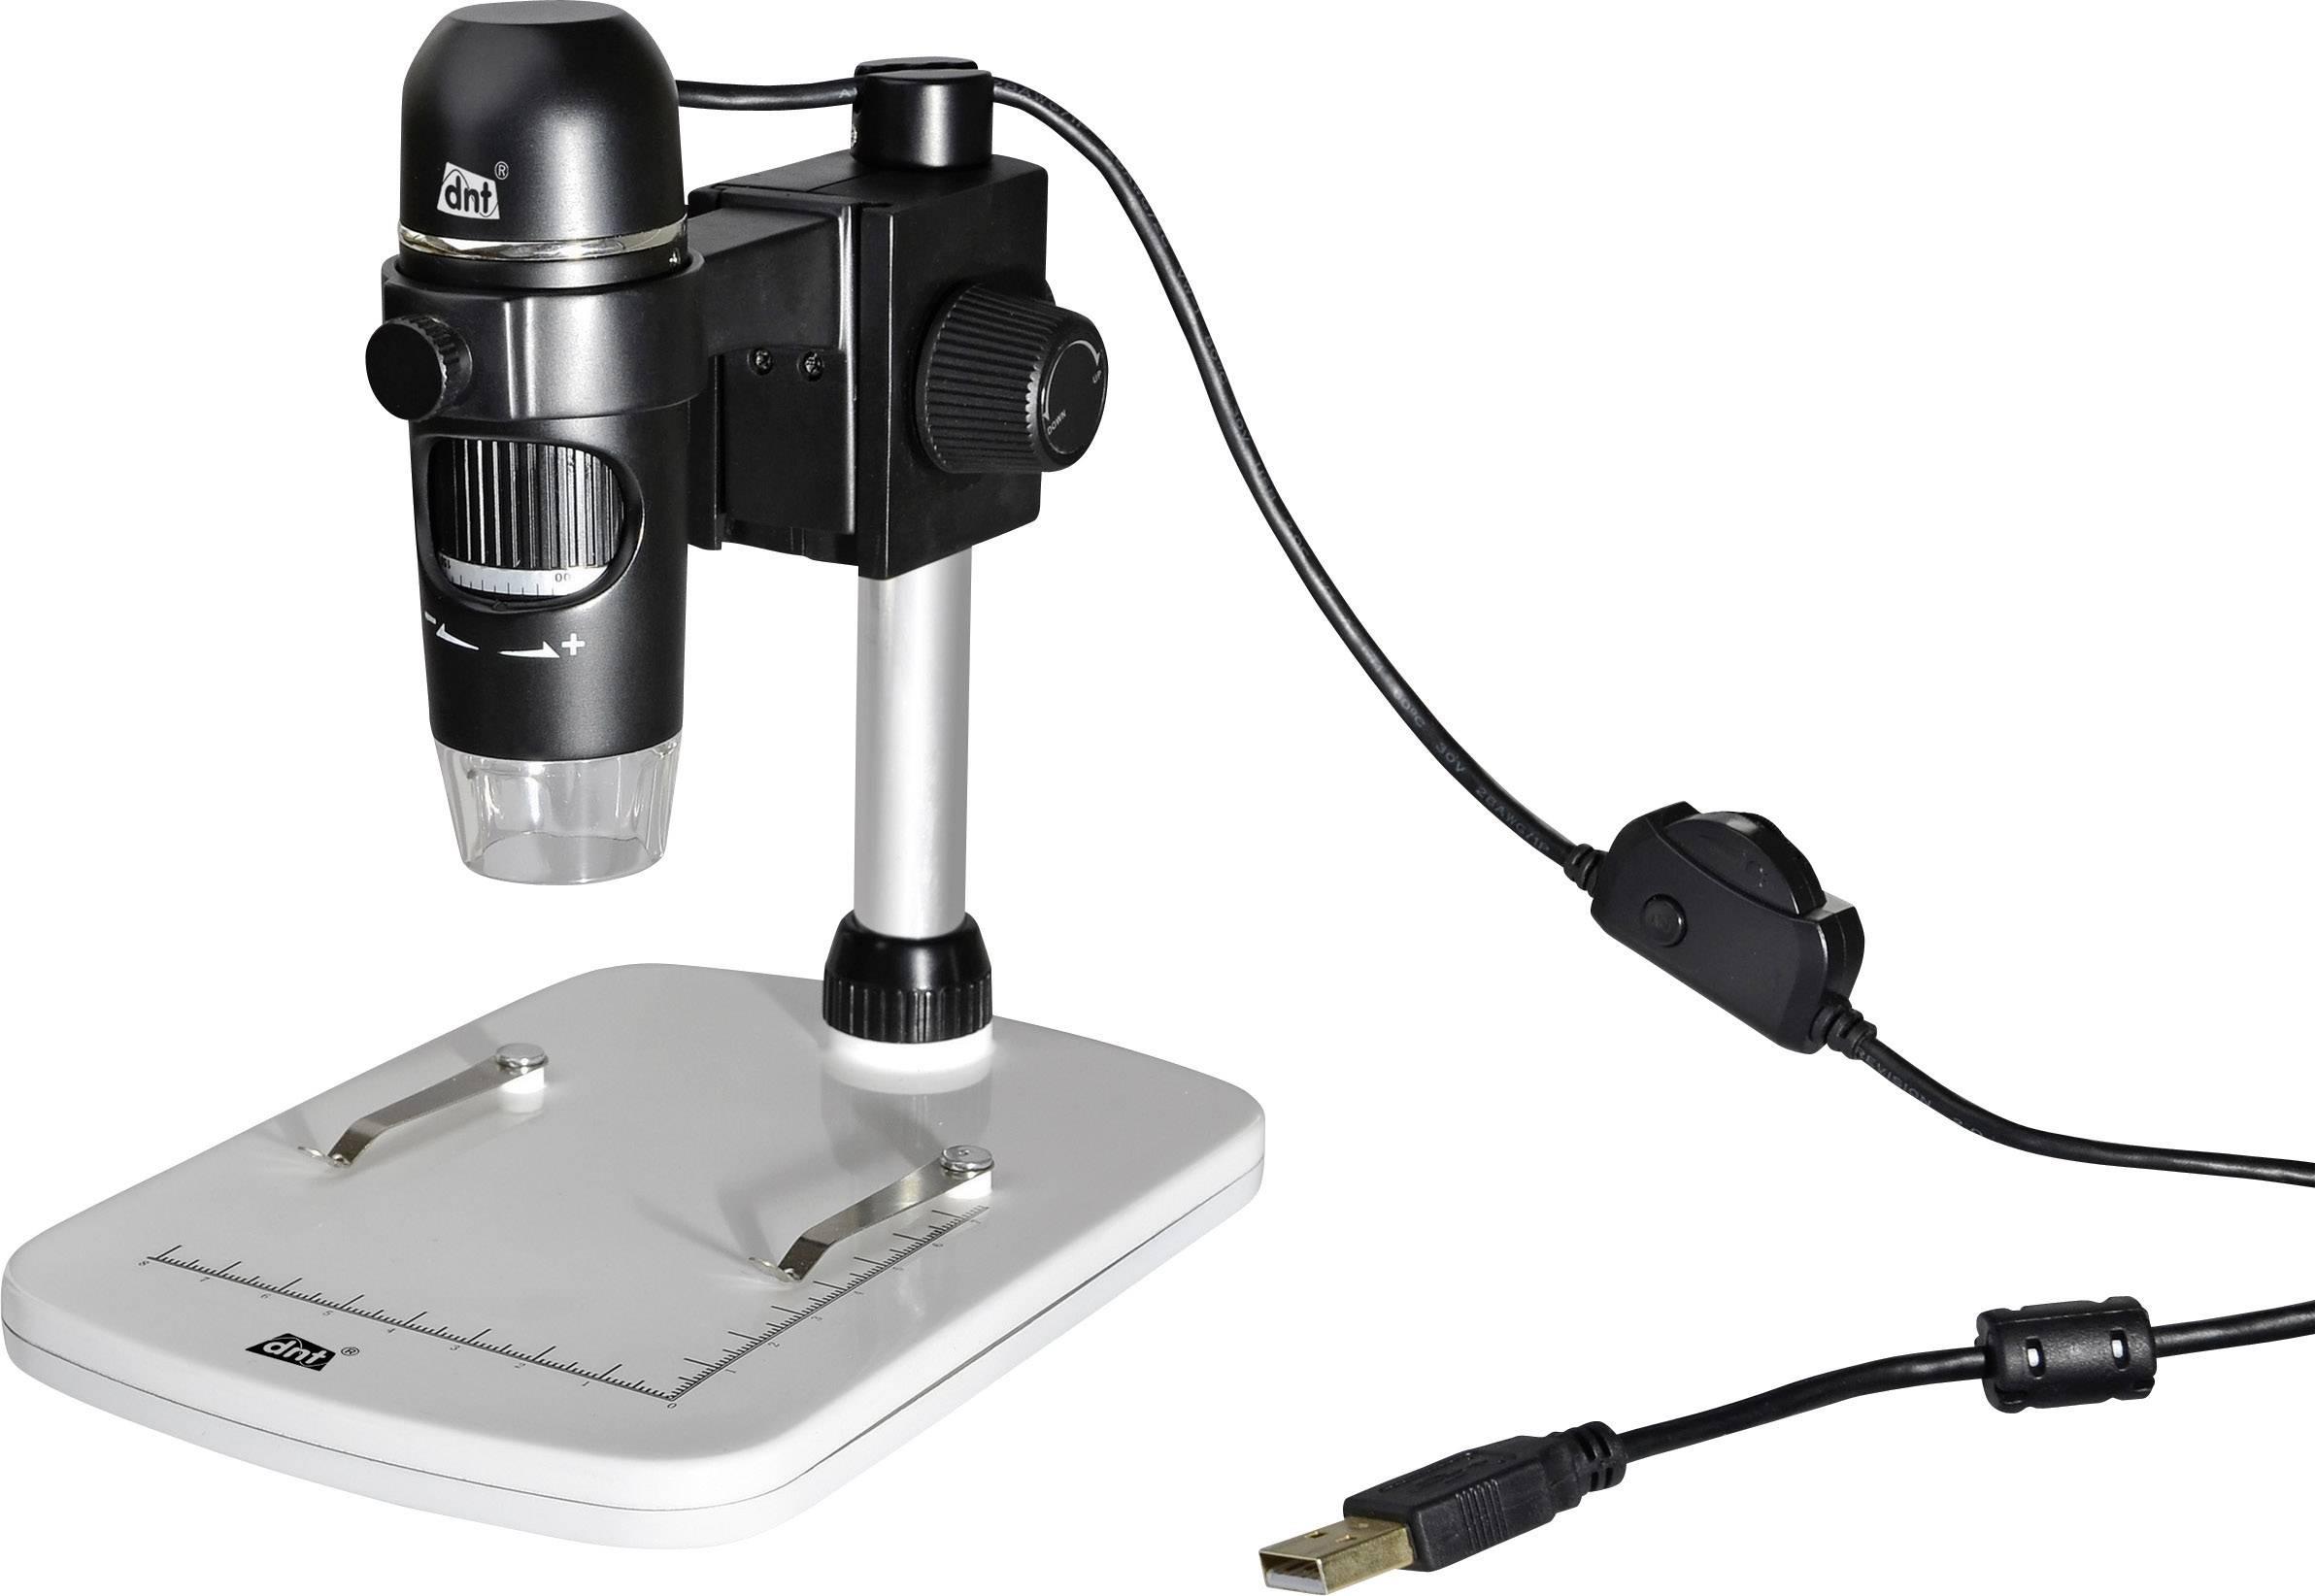 Mikroskop cyfrowy usb dnt digimicro profi 5 mpx n a minimalne